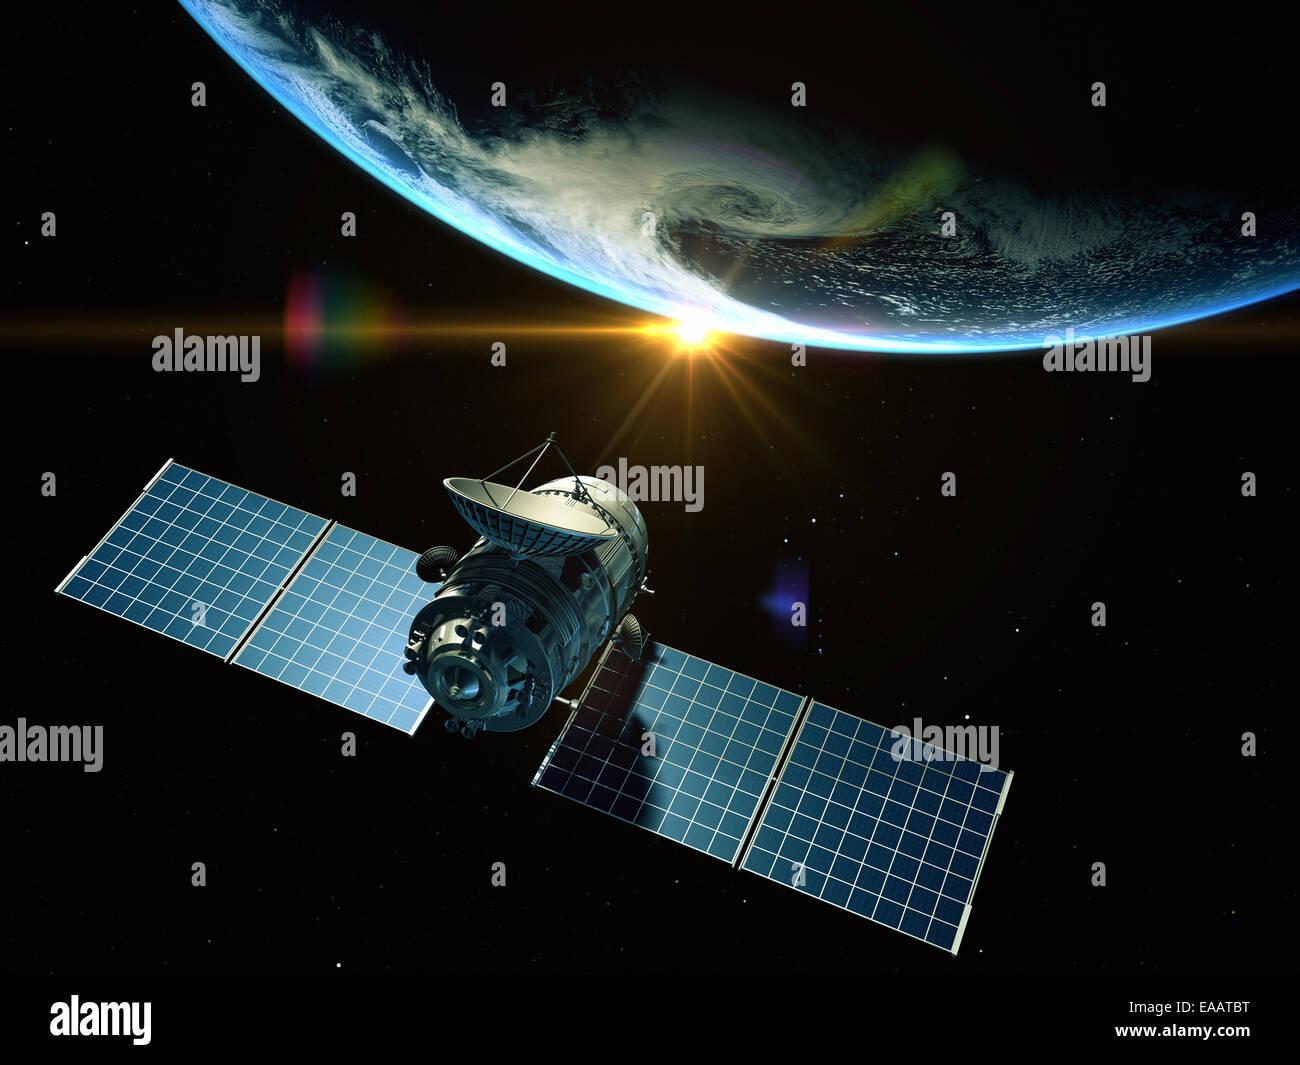 Satellite is orbiting around the Earth - Stock Image